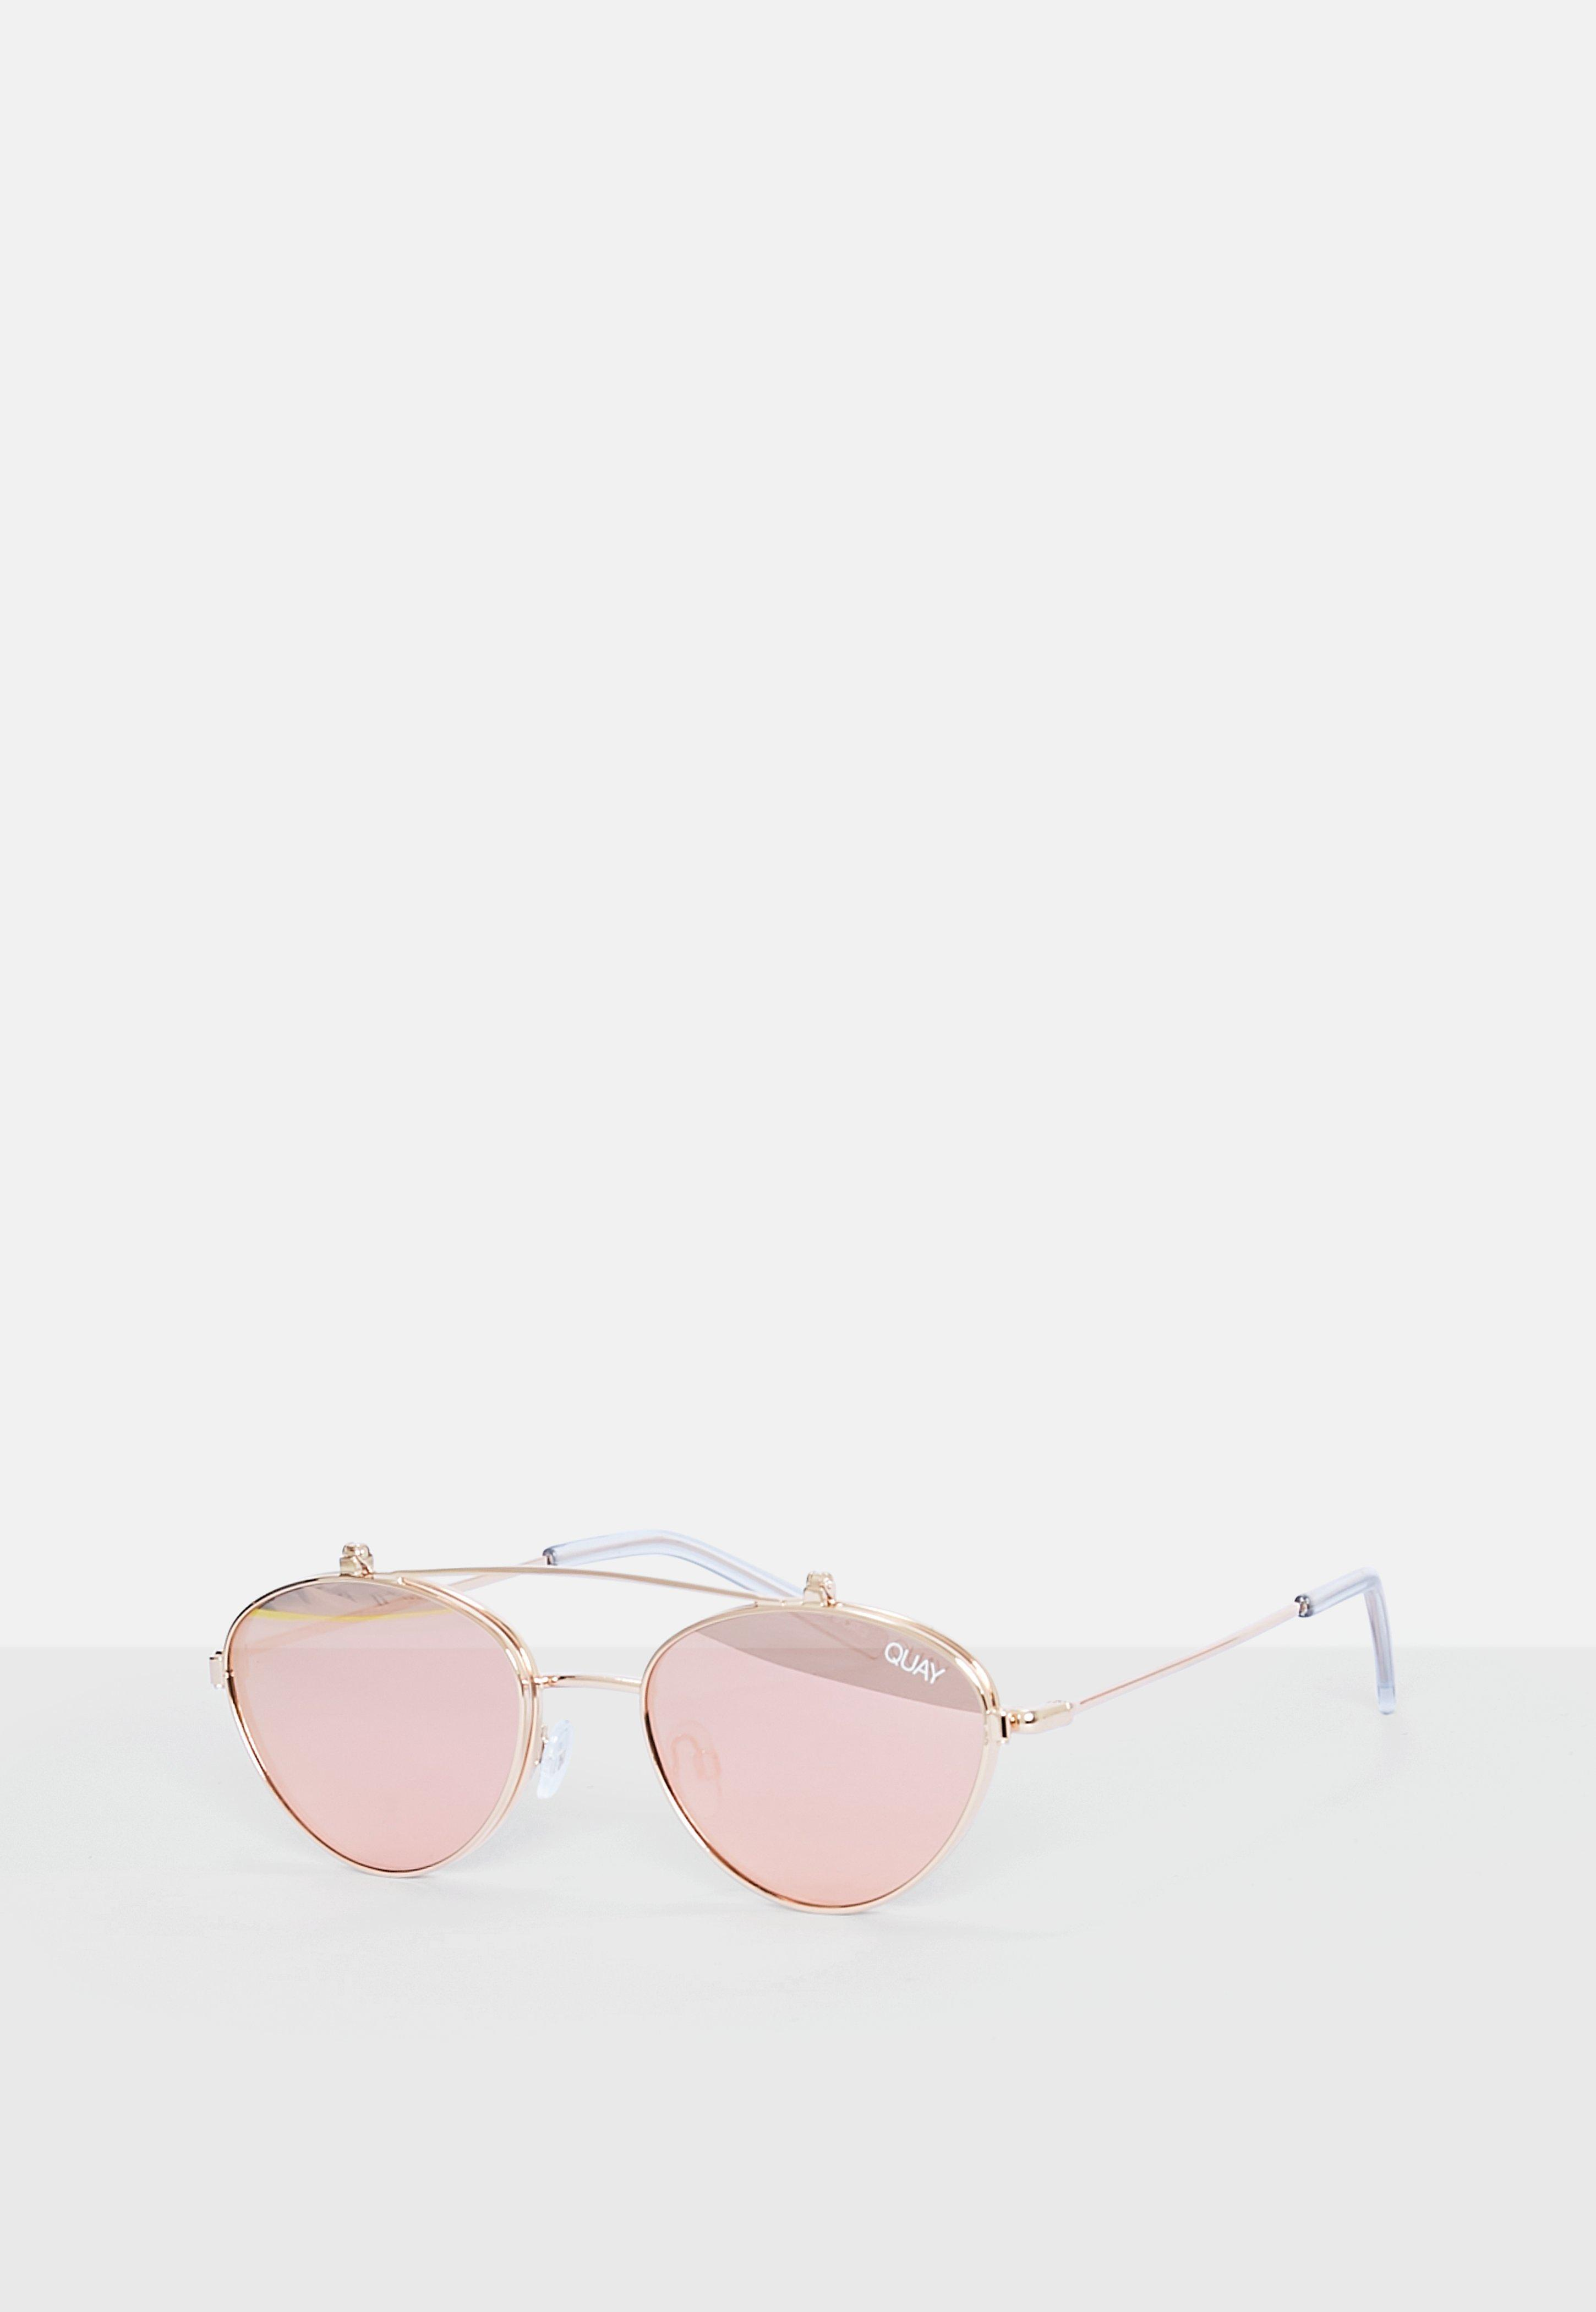 b4186d4fac ... Quay Australia X Elle Ferguson Elle Rose Gold Sunglasses - Lyst. View  fullscreen